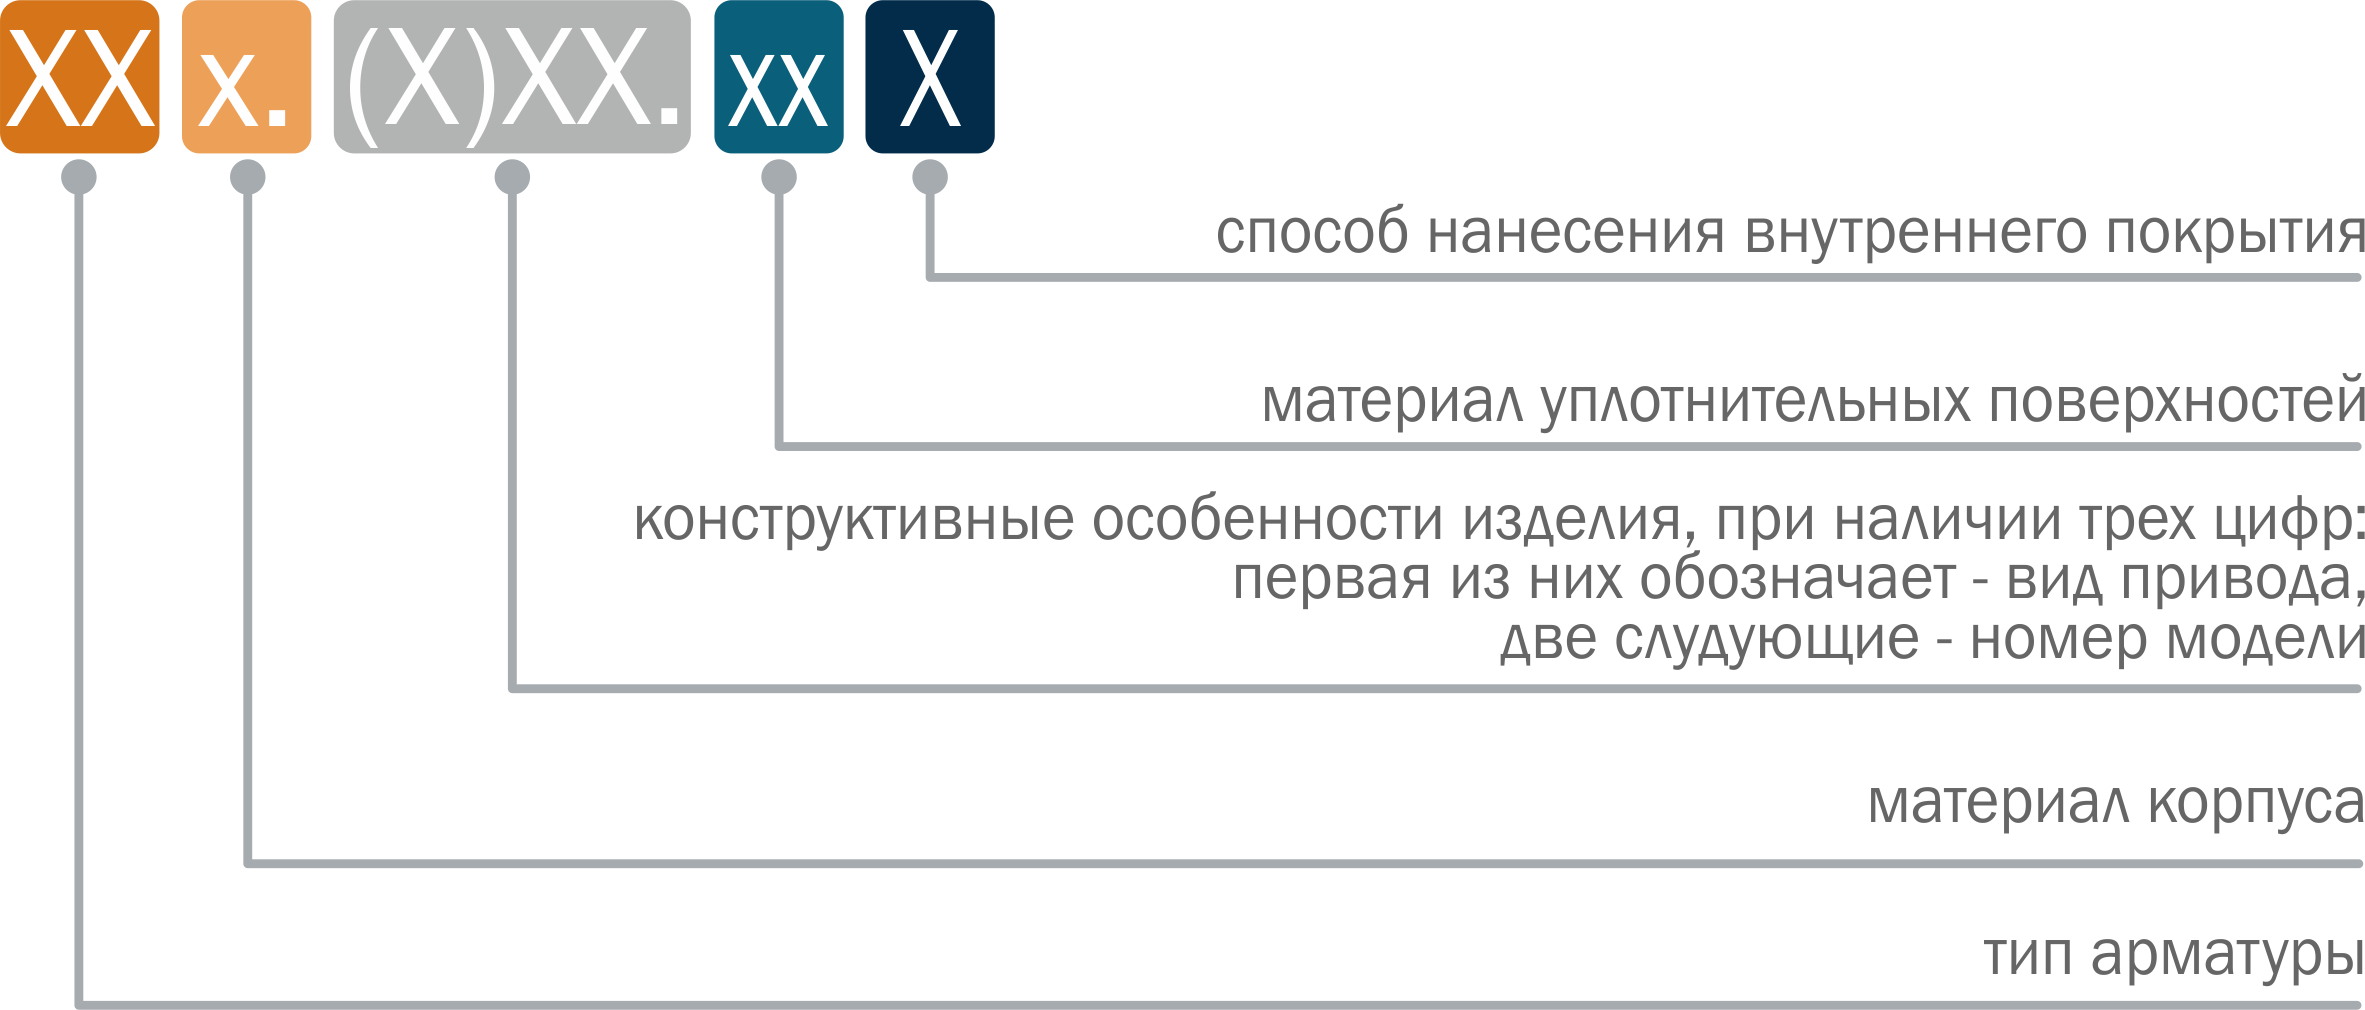 клапан кгэз-65 инструкция